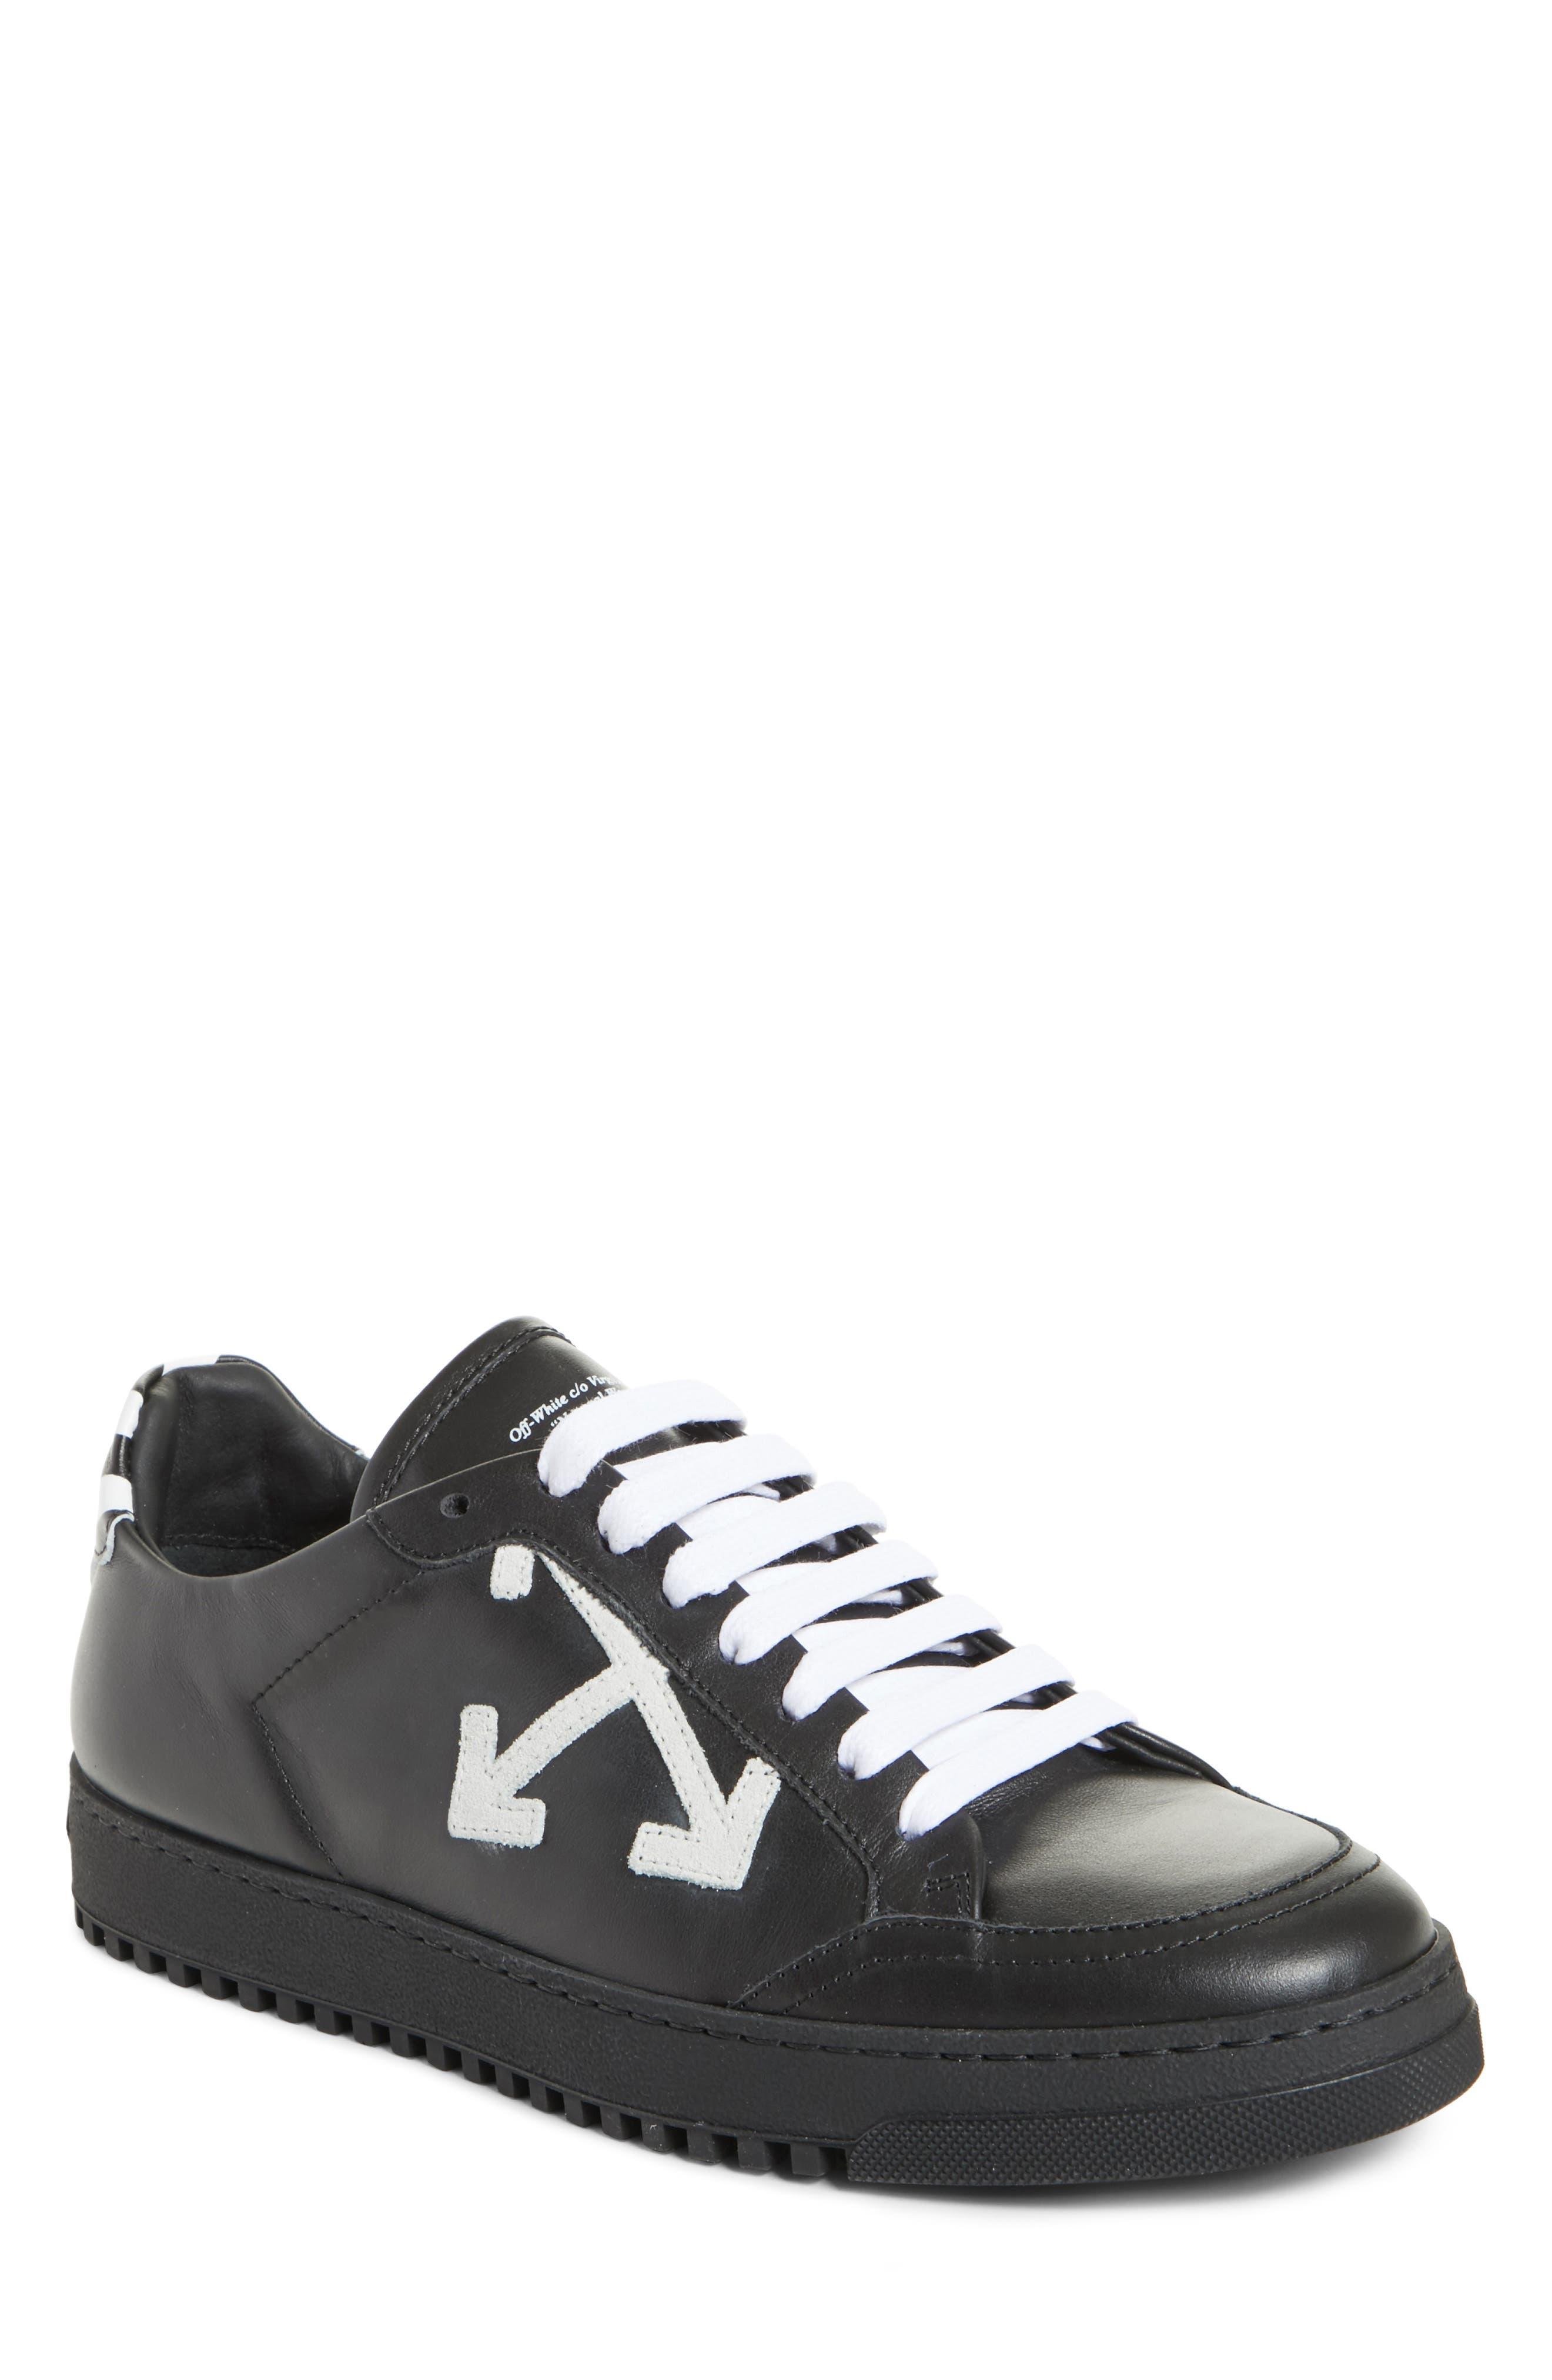 Arrow Sneaker,                         Main,                         color, BLACK WHITE